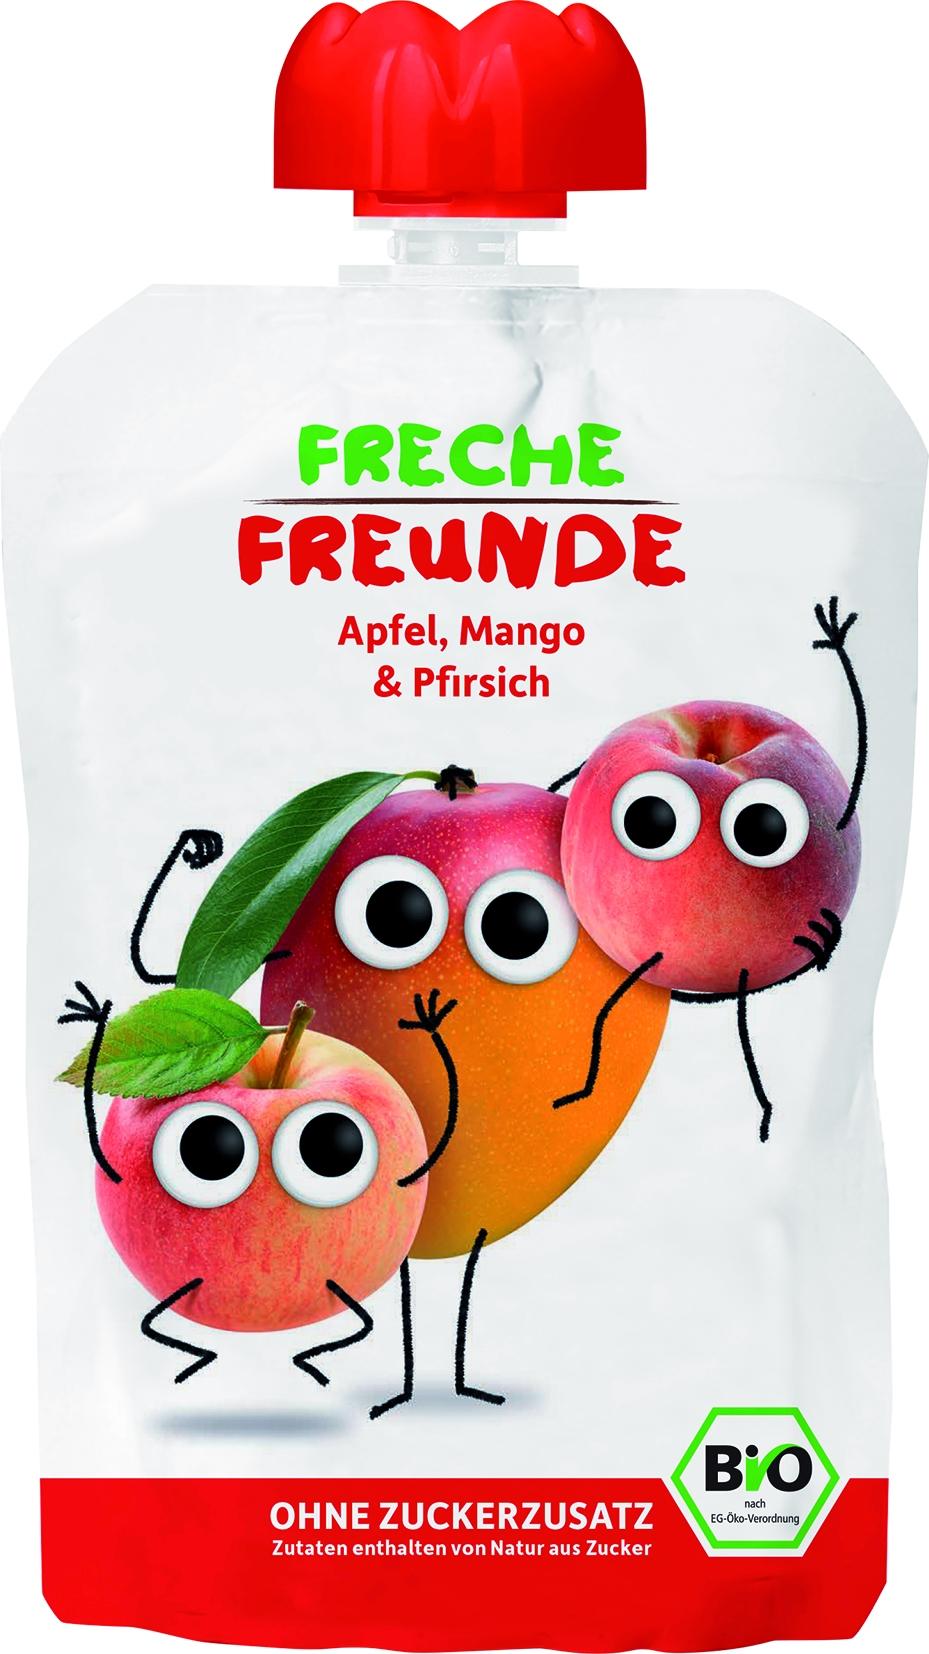 Freche Freunde - Apfel /Mango /Pfirsich